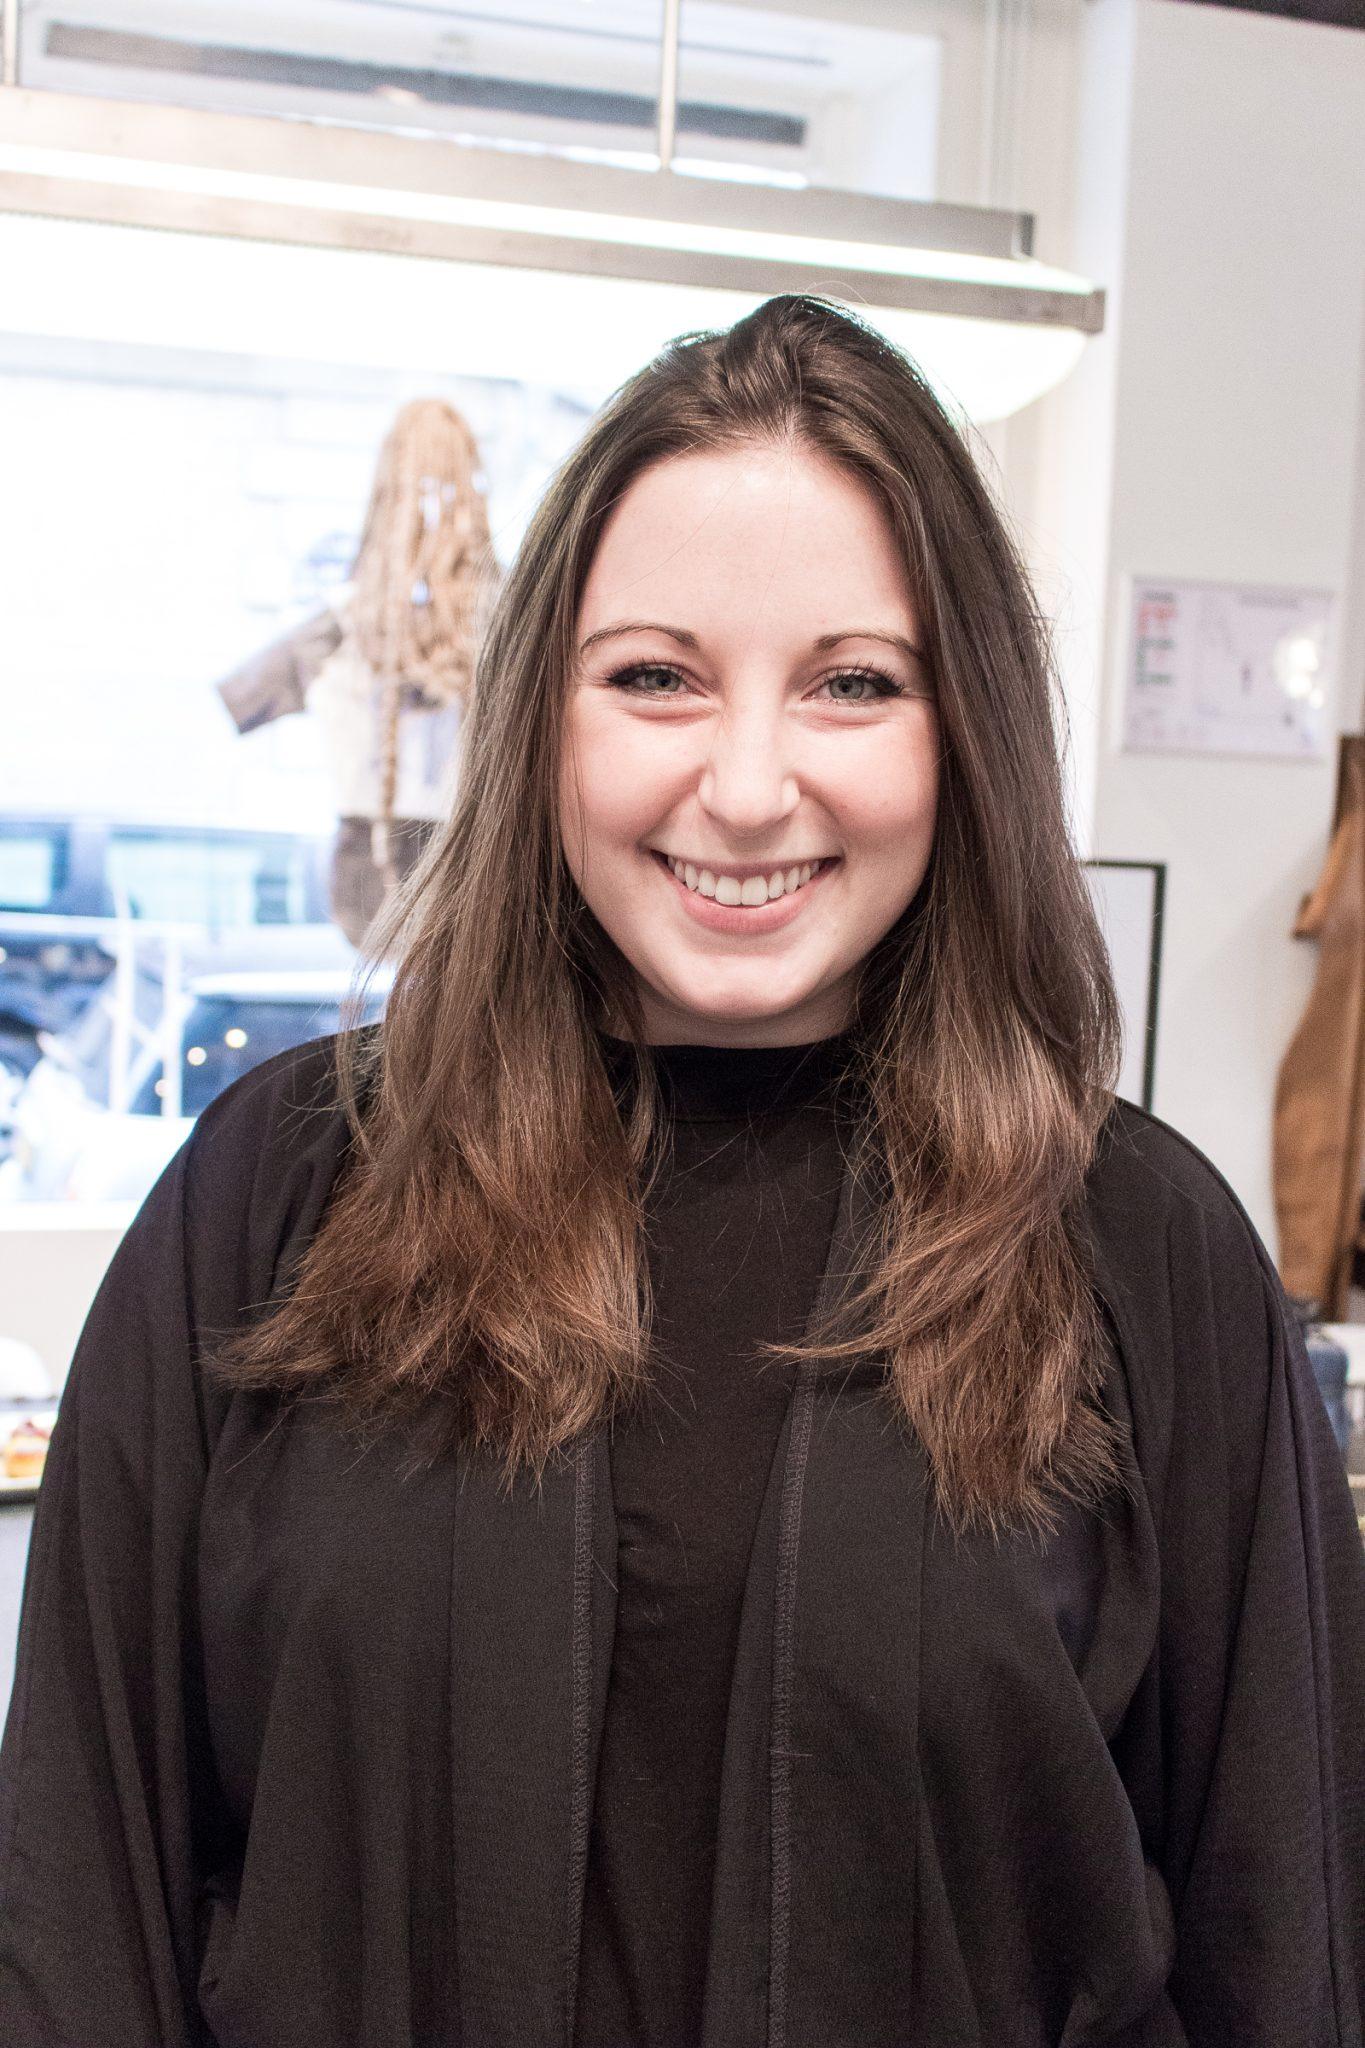 The Best English Speaking Hair Salon in Paris - The ...